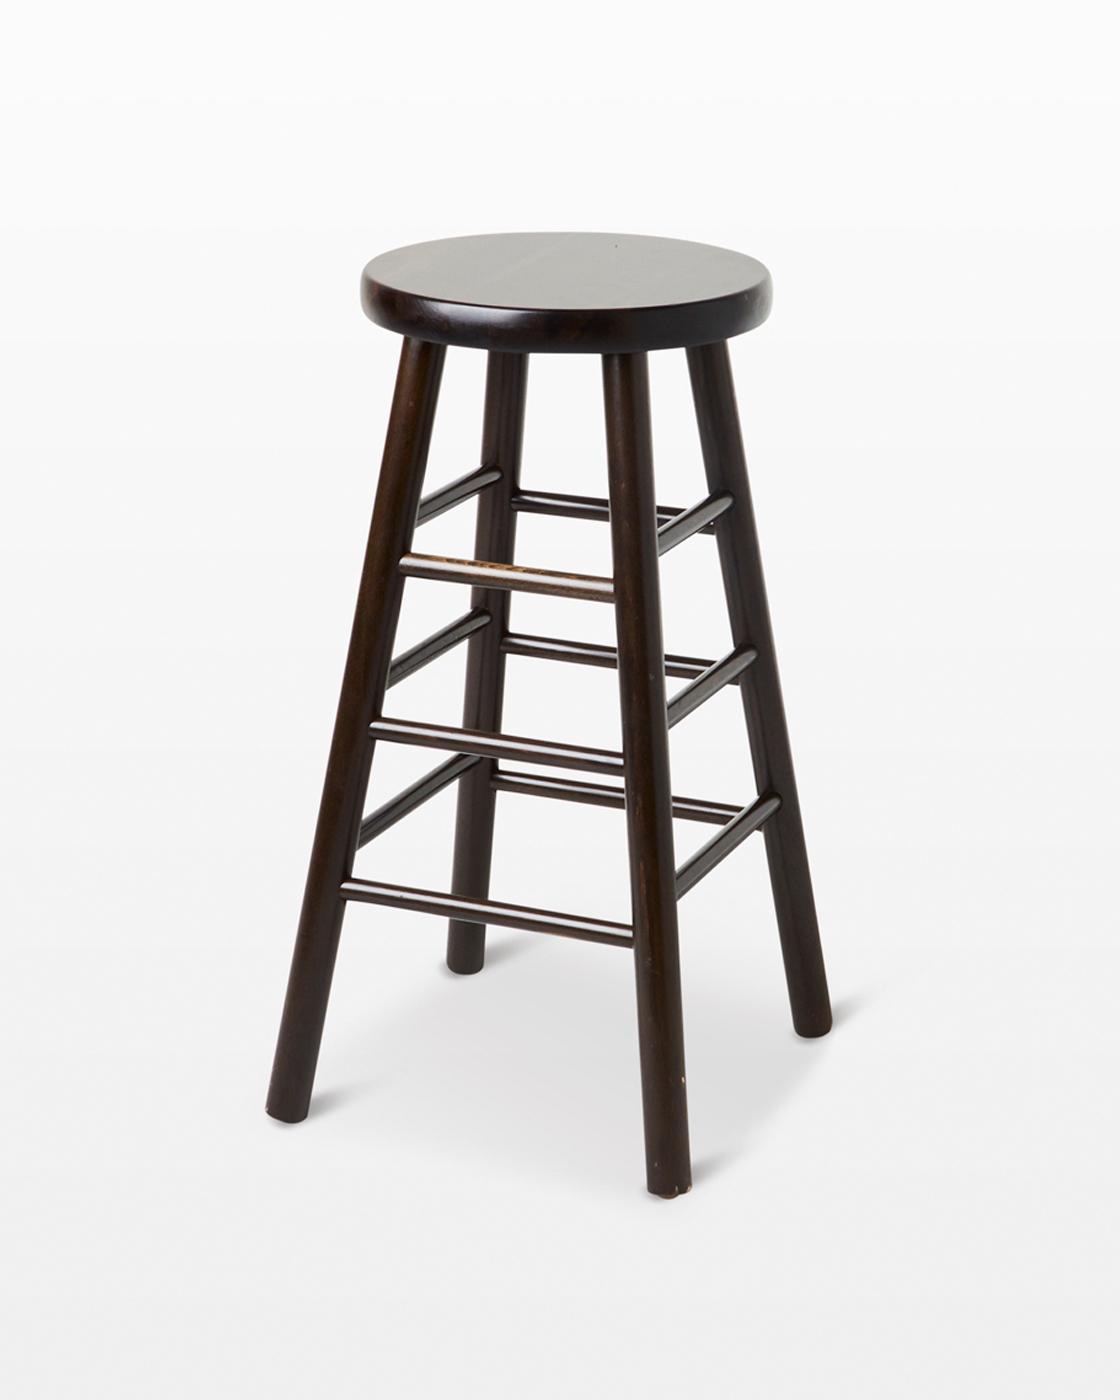 Sensational St118 Warren Dark Brown Stool Prop Rental Acme Brooklyn Ncnpc Chair Design For Home Ncnpcorg